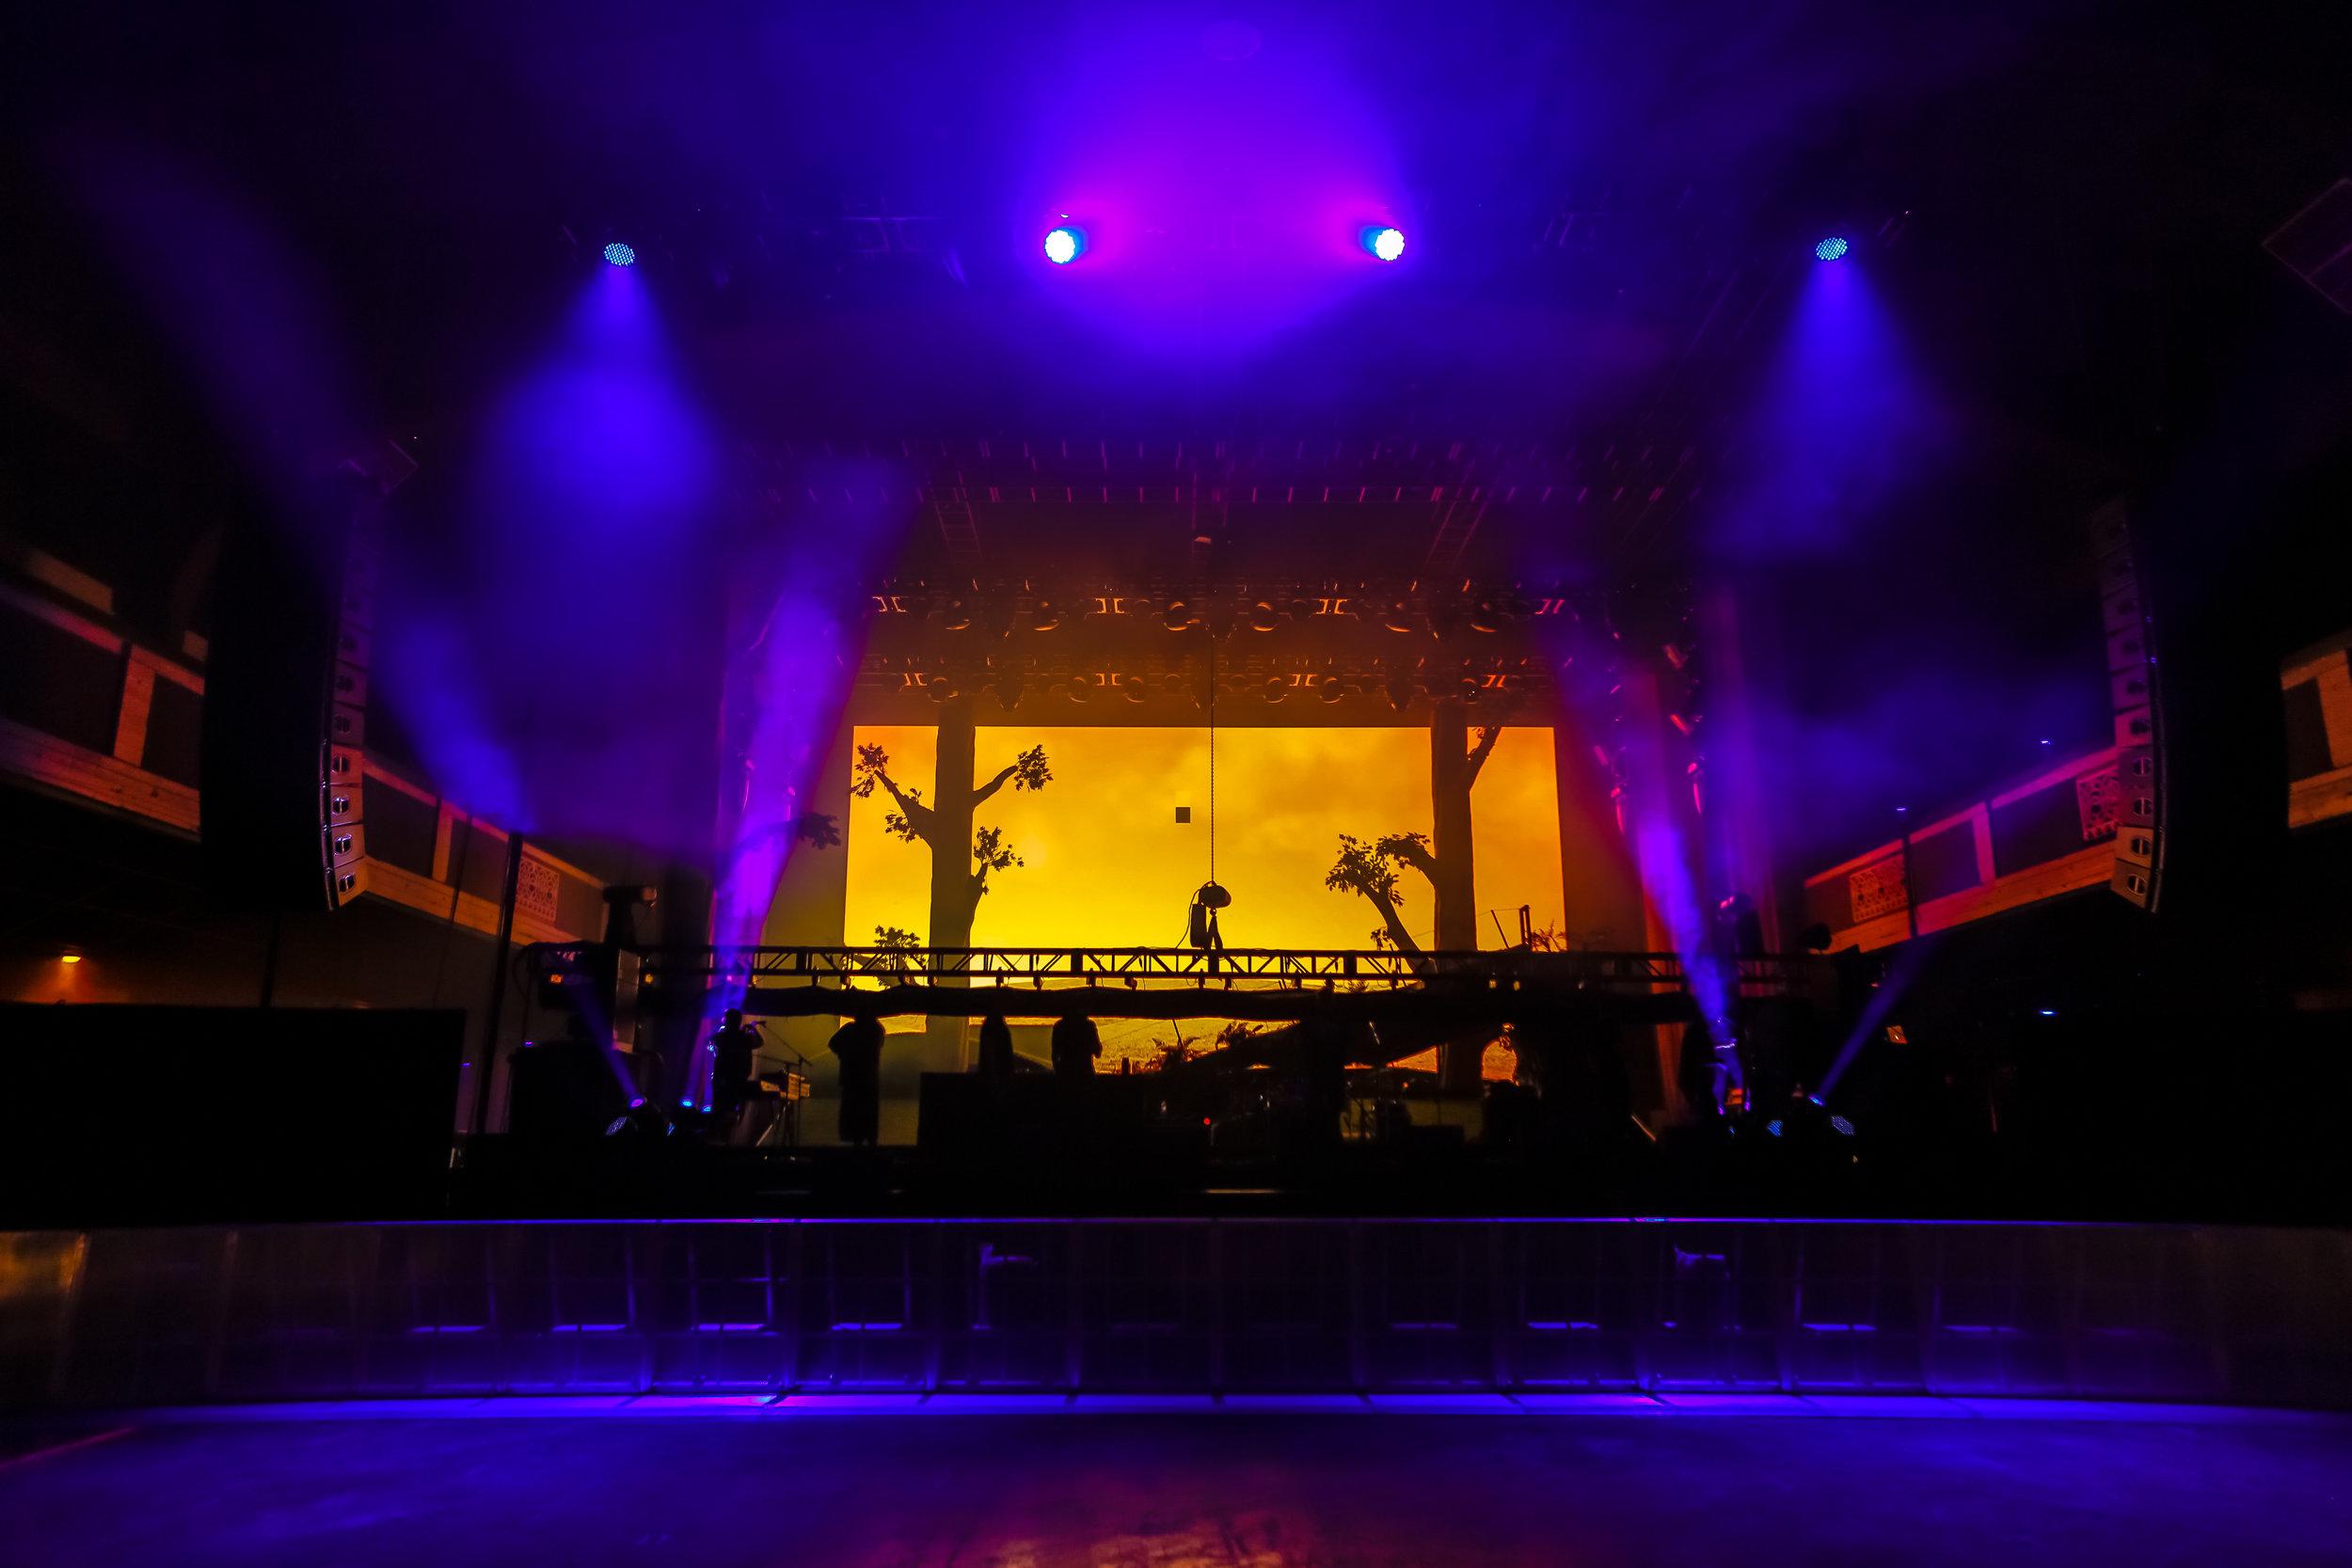 Setting up the kabuki at the Shrine Auditorium LA before the show on 4/11/18